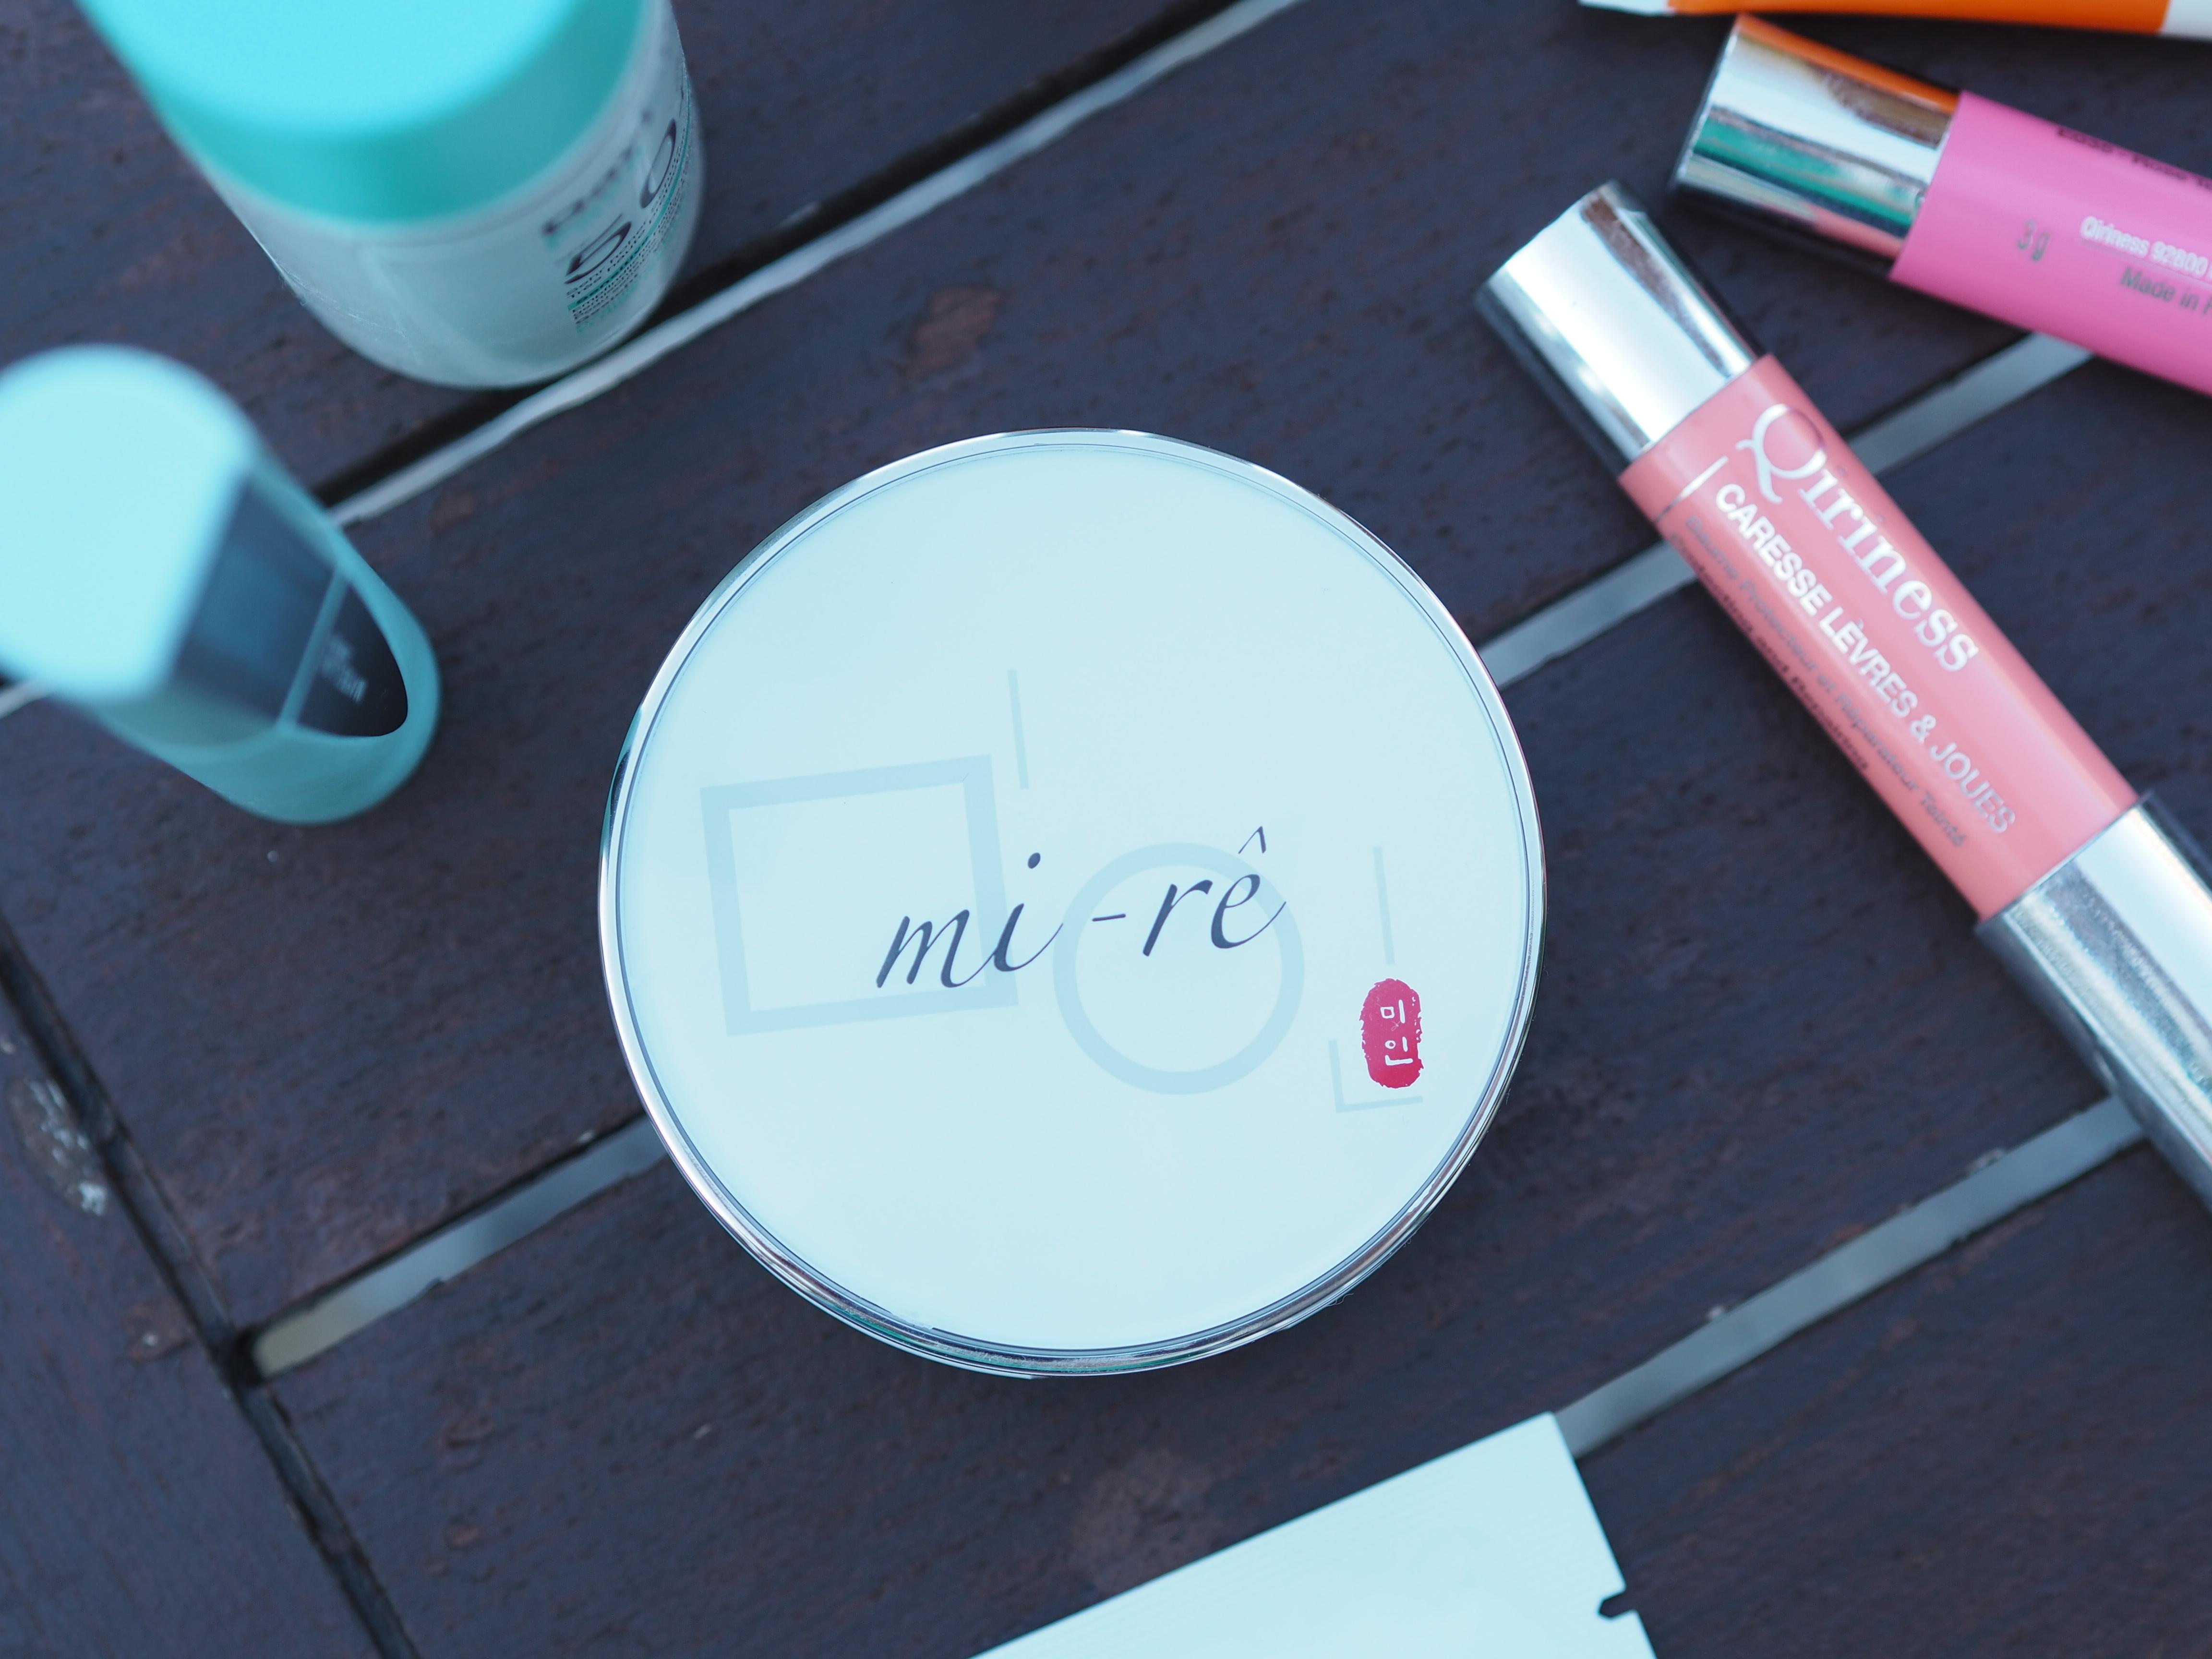 maquillage avec spf50